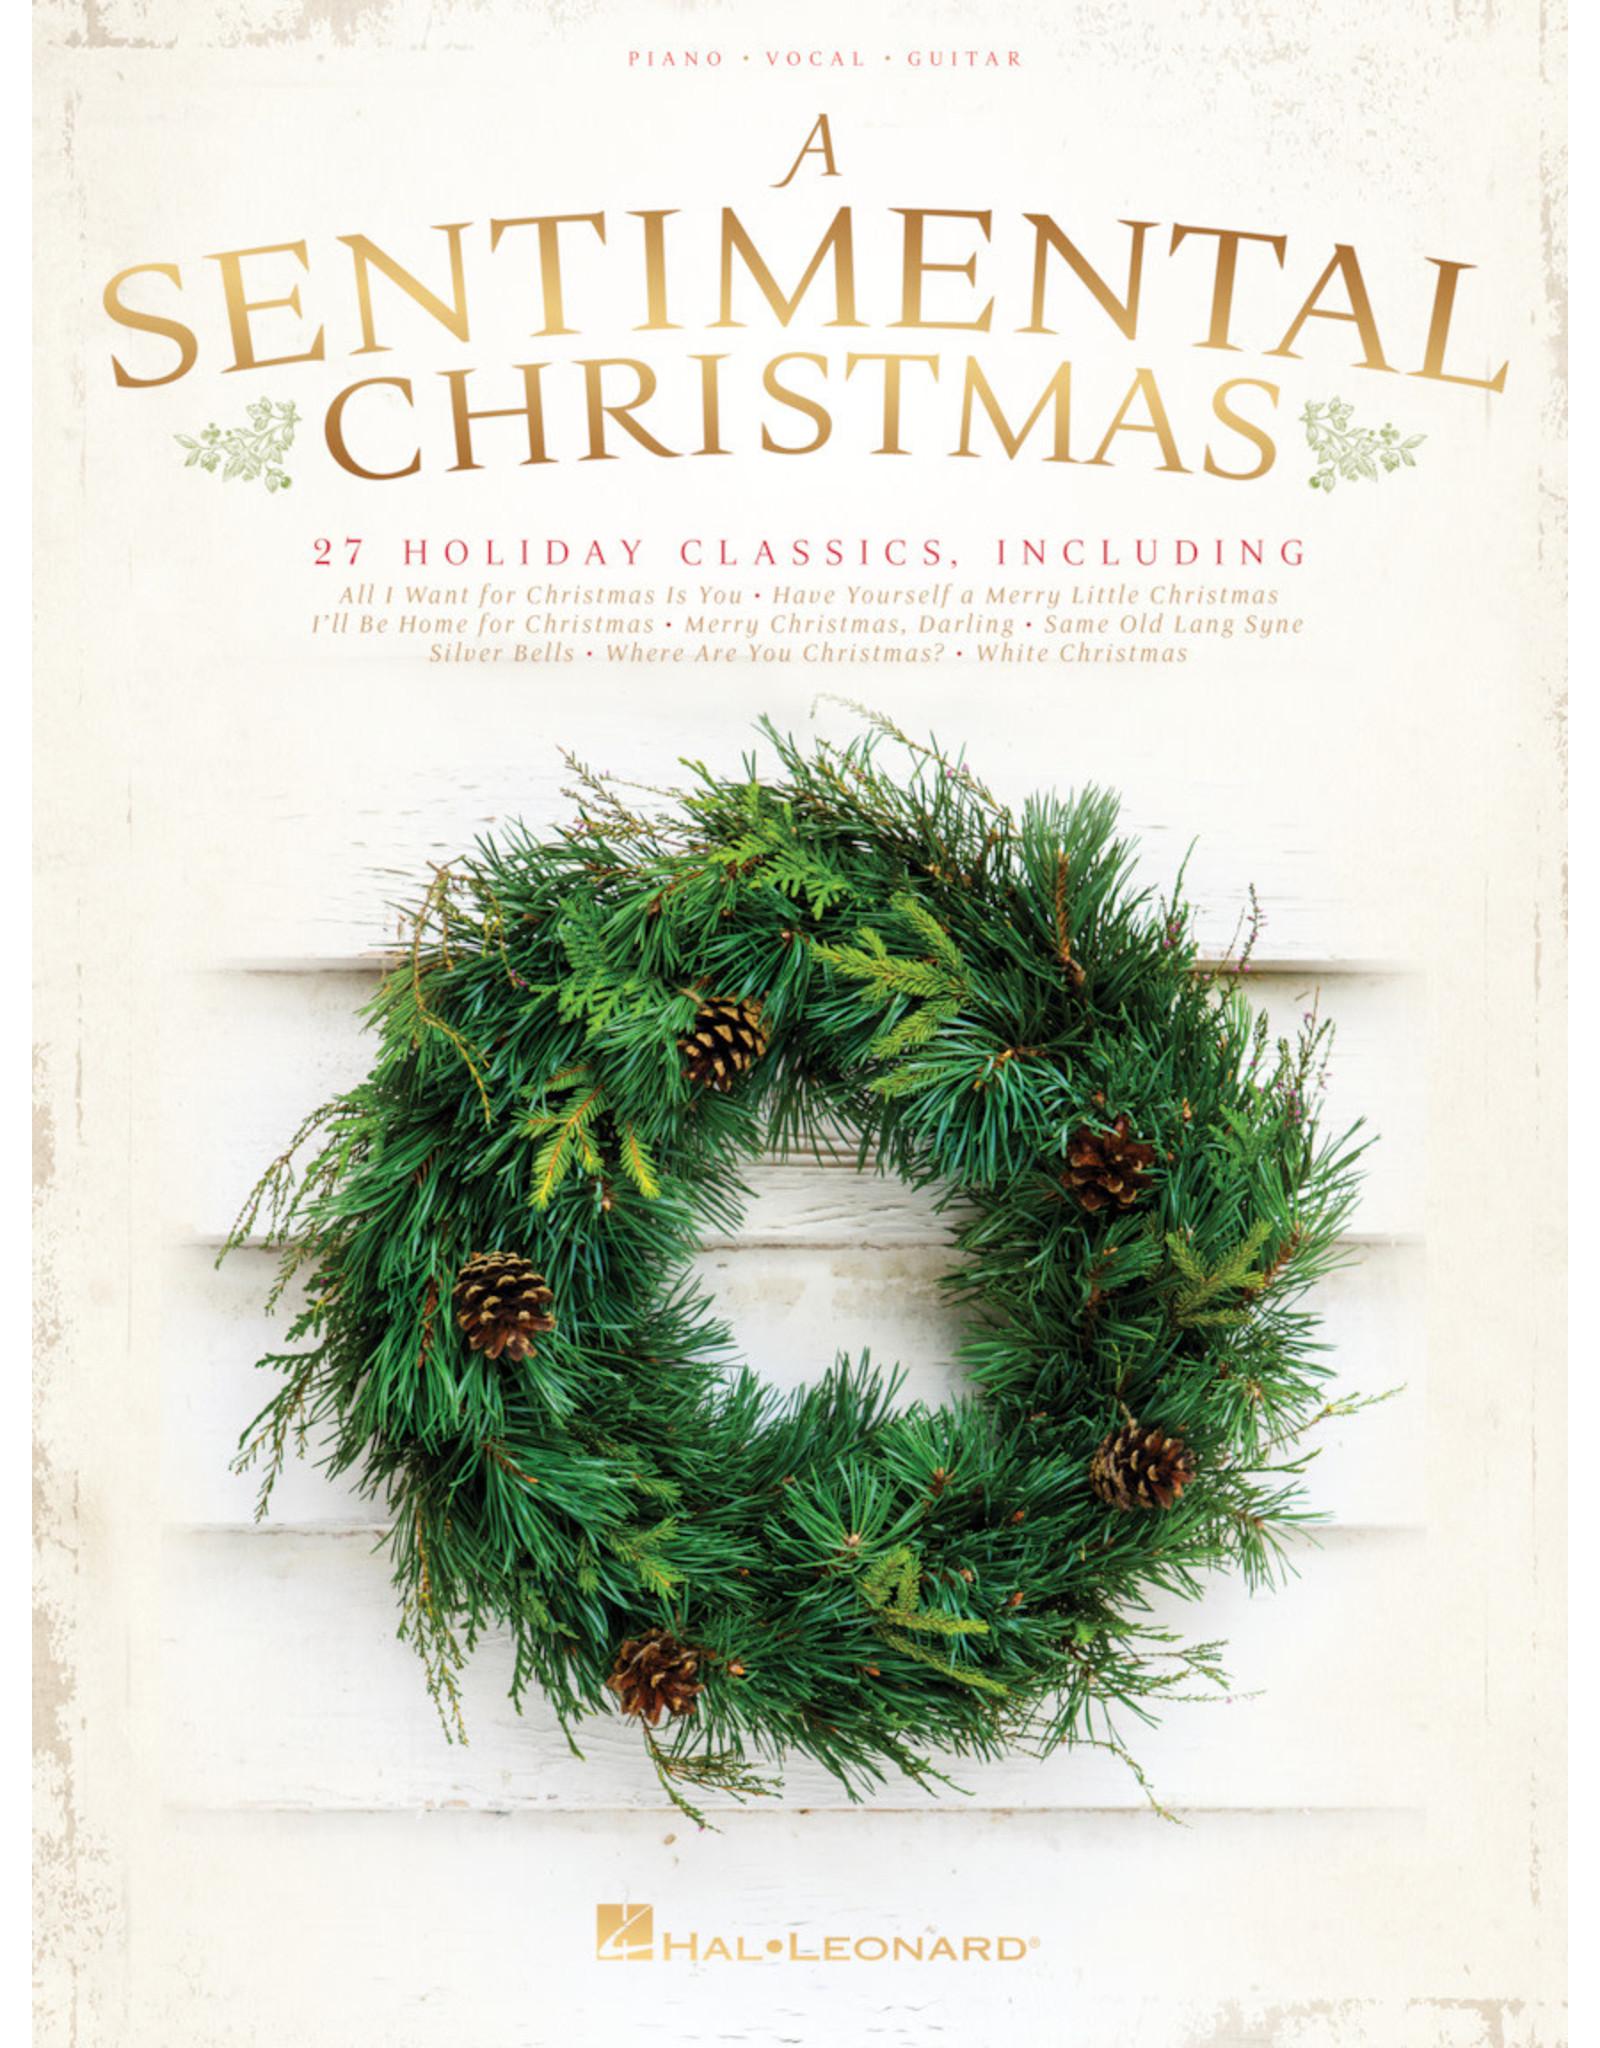 Hal Leonard Sentimental Christmas Book PVG